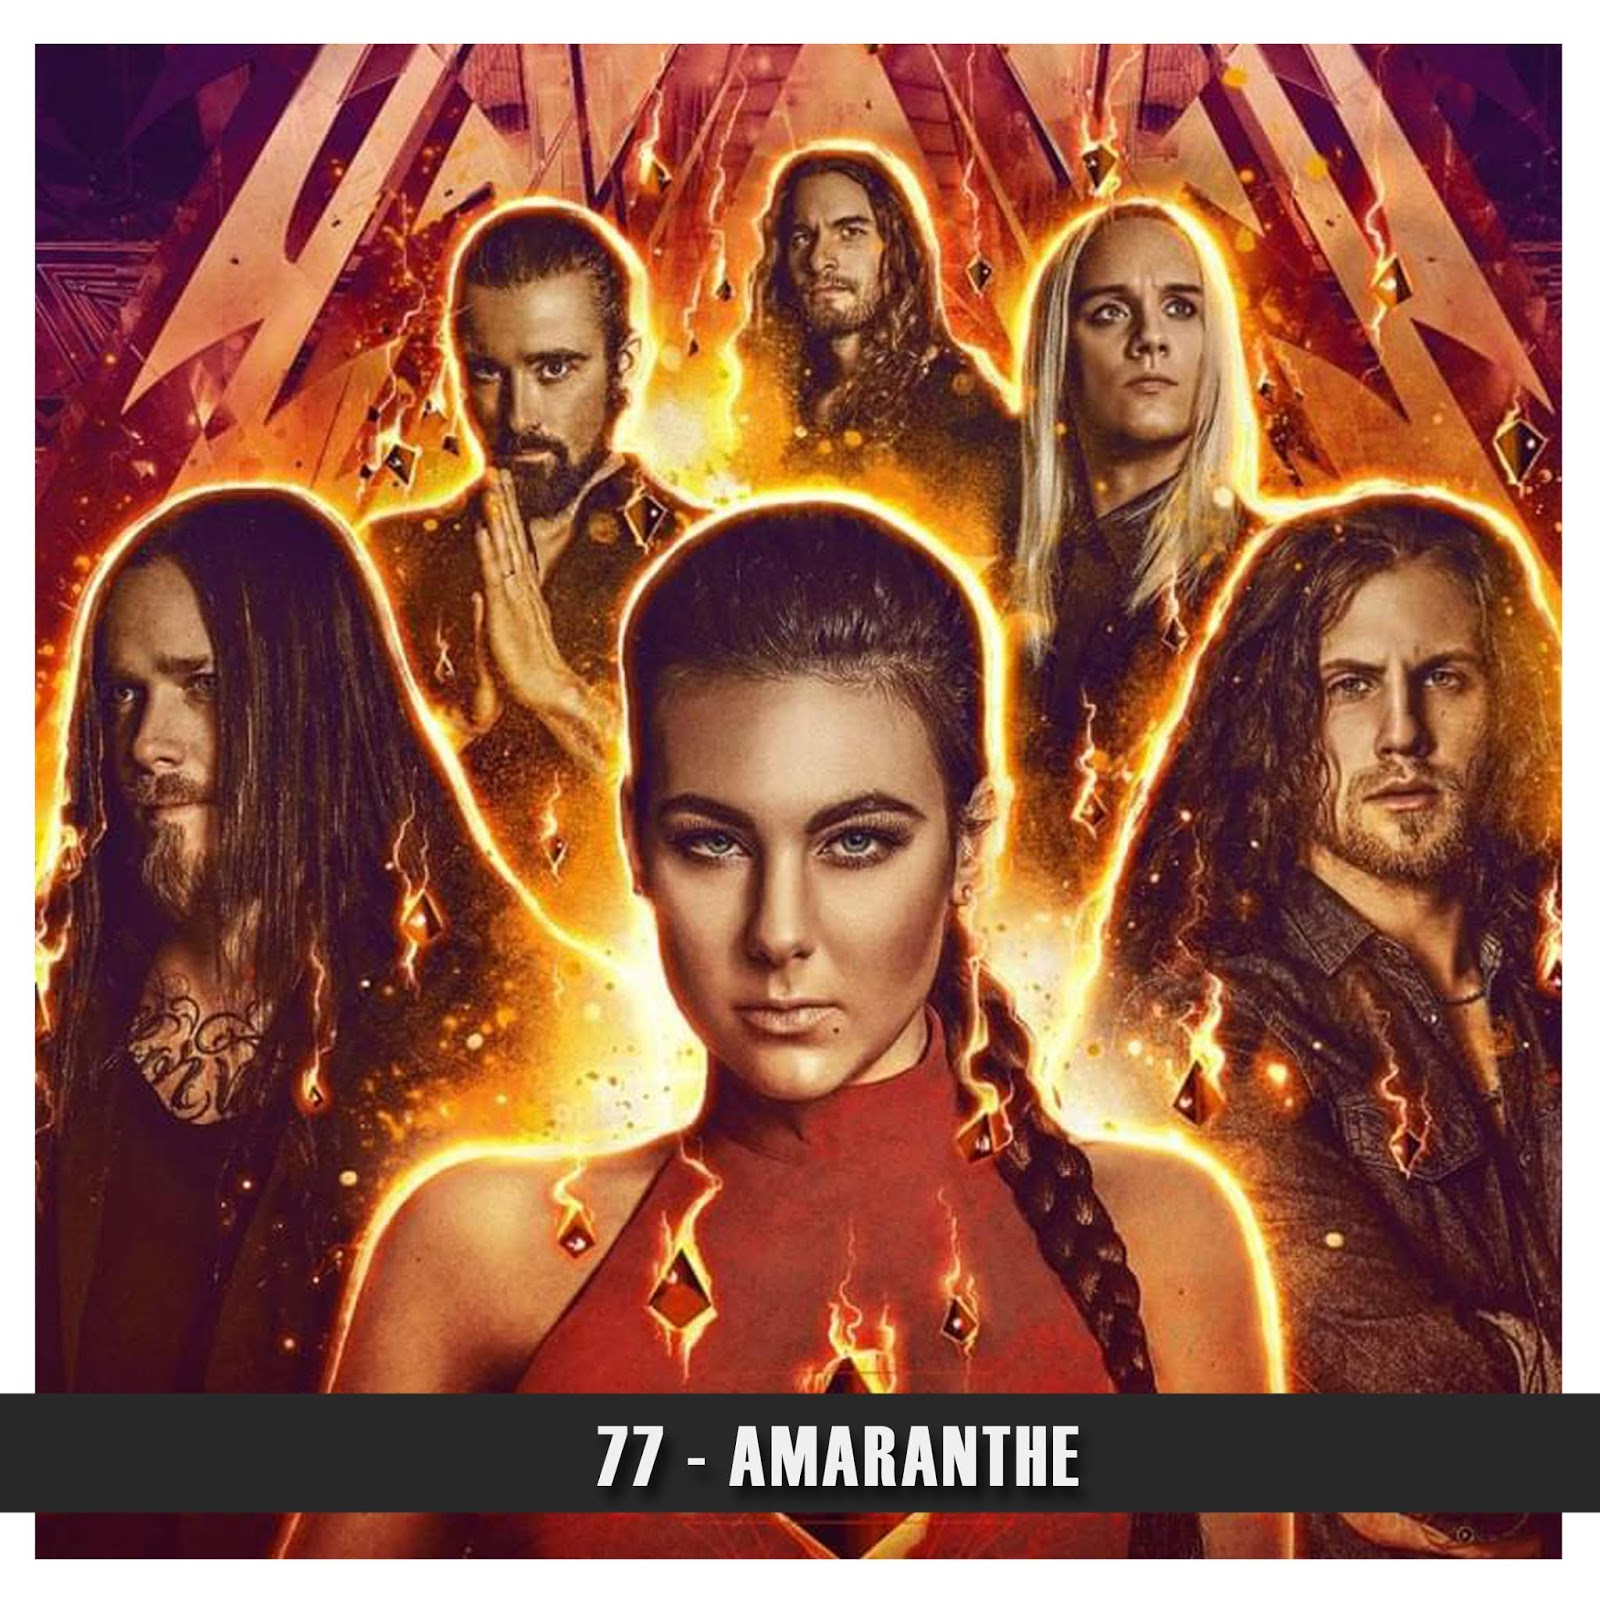 Doublecast 77 - Amaranthe